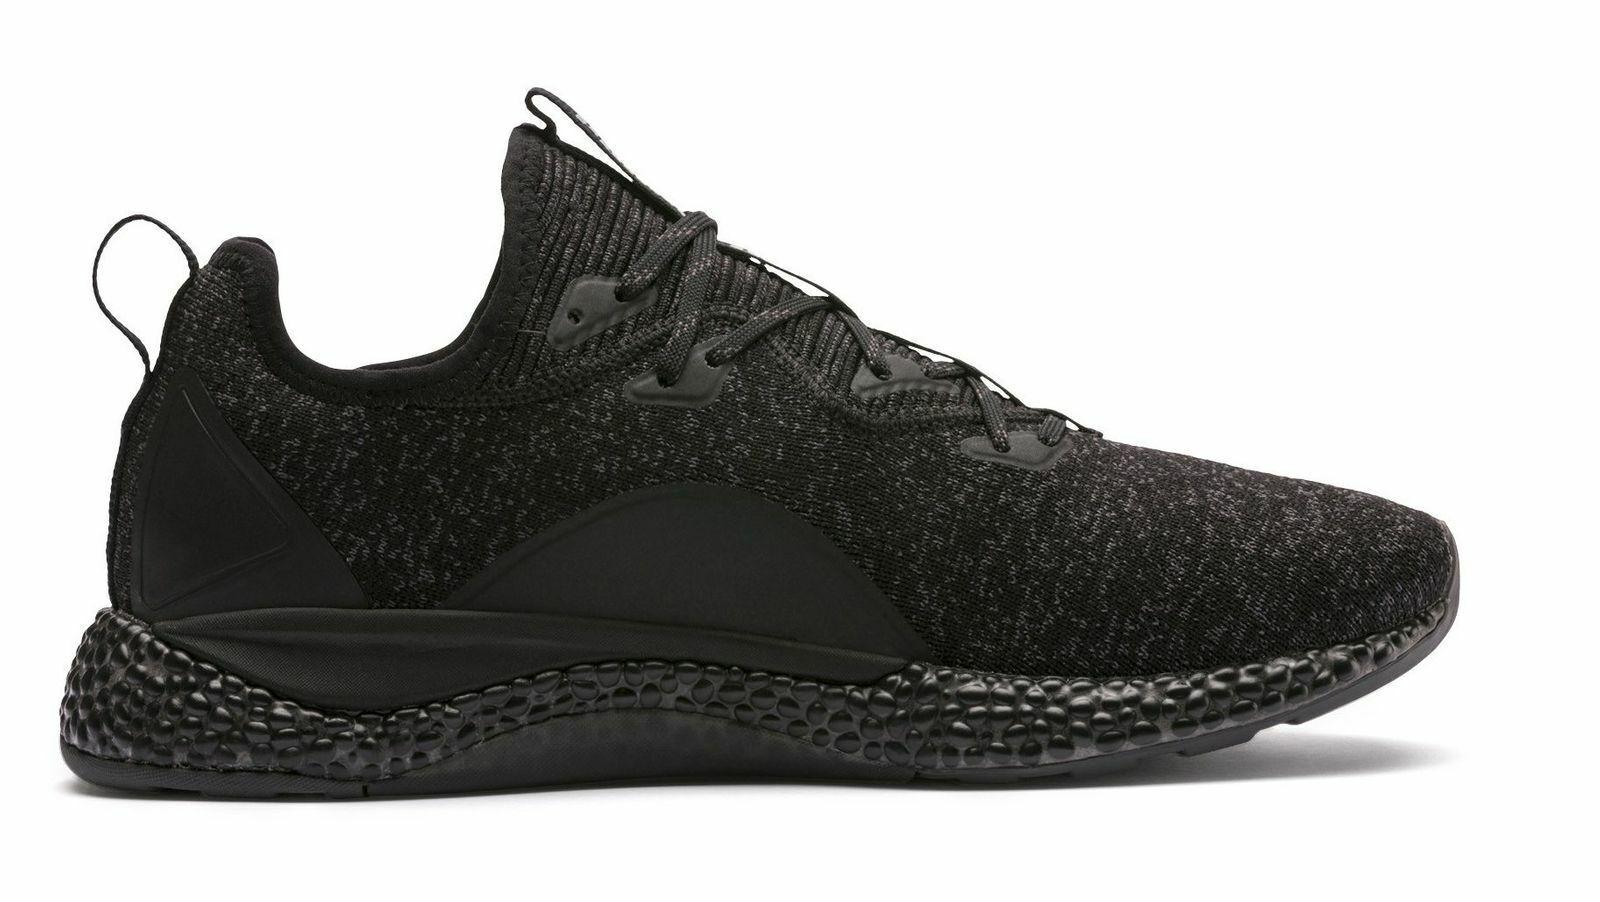 Puma shoes da Corsa da men shoes Casual Ibrido Runner black 191111 10